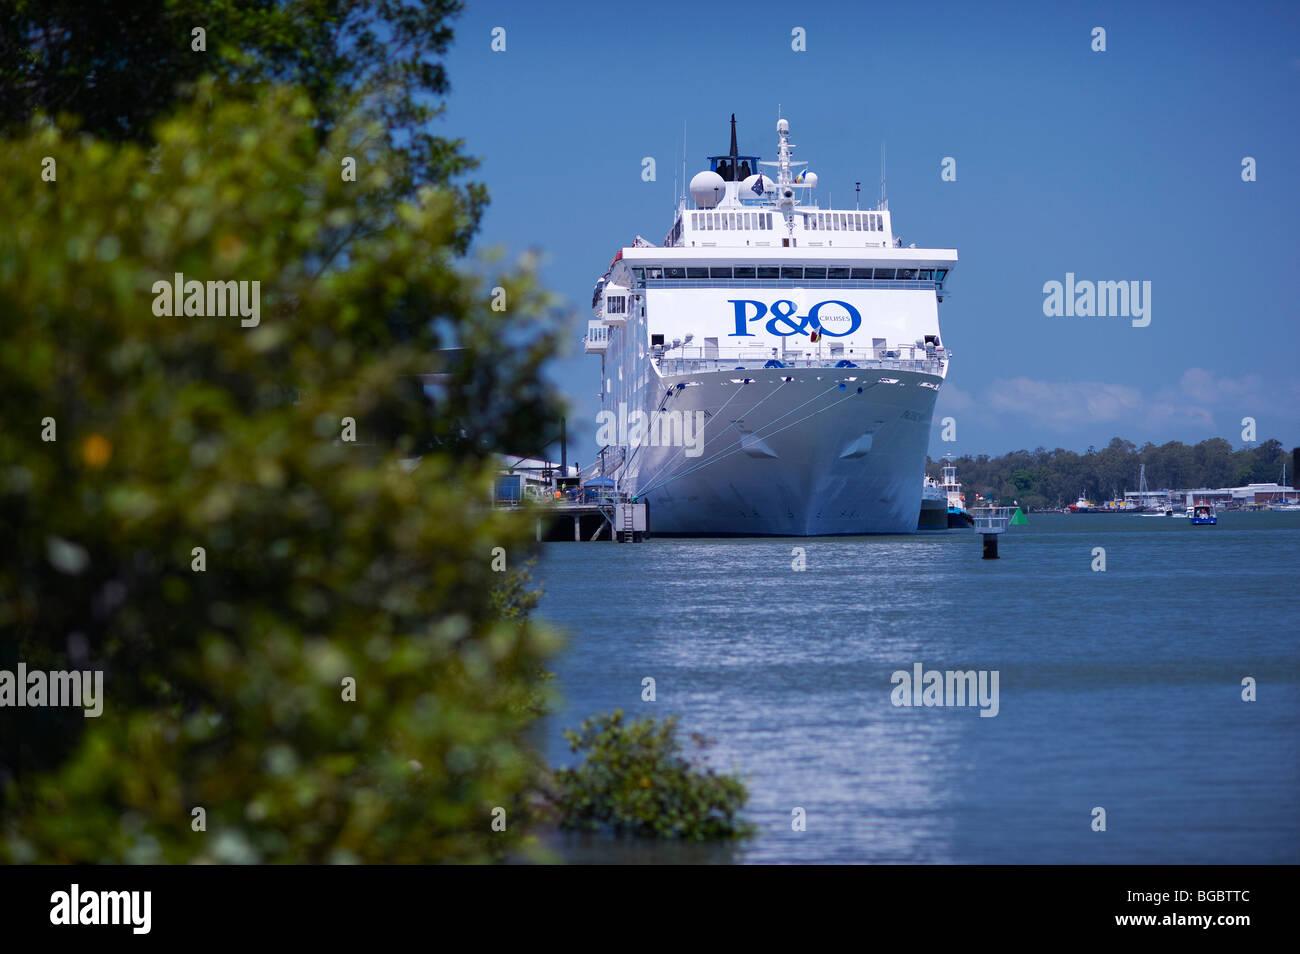 P&O Pacific Sun docked at Portside Wharf Cruiseship Terminal Brisbane - Stock Image